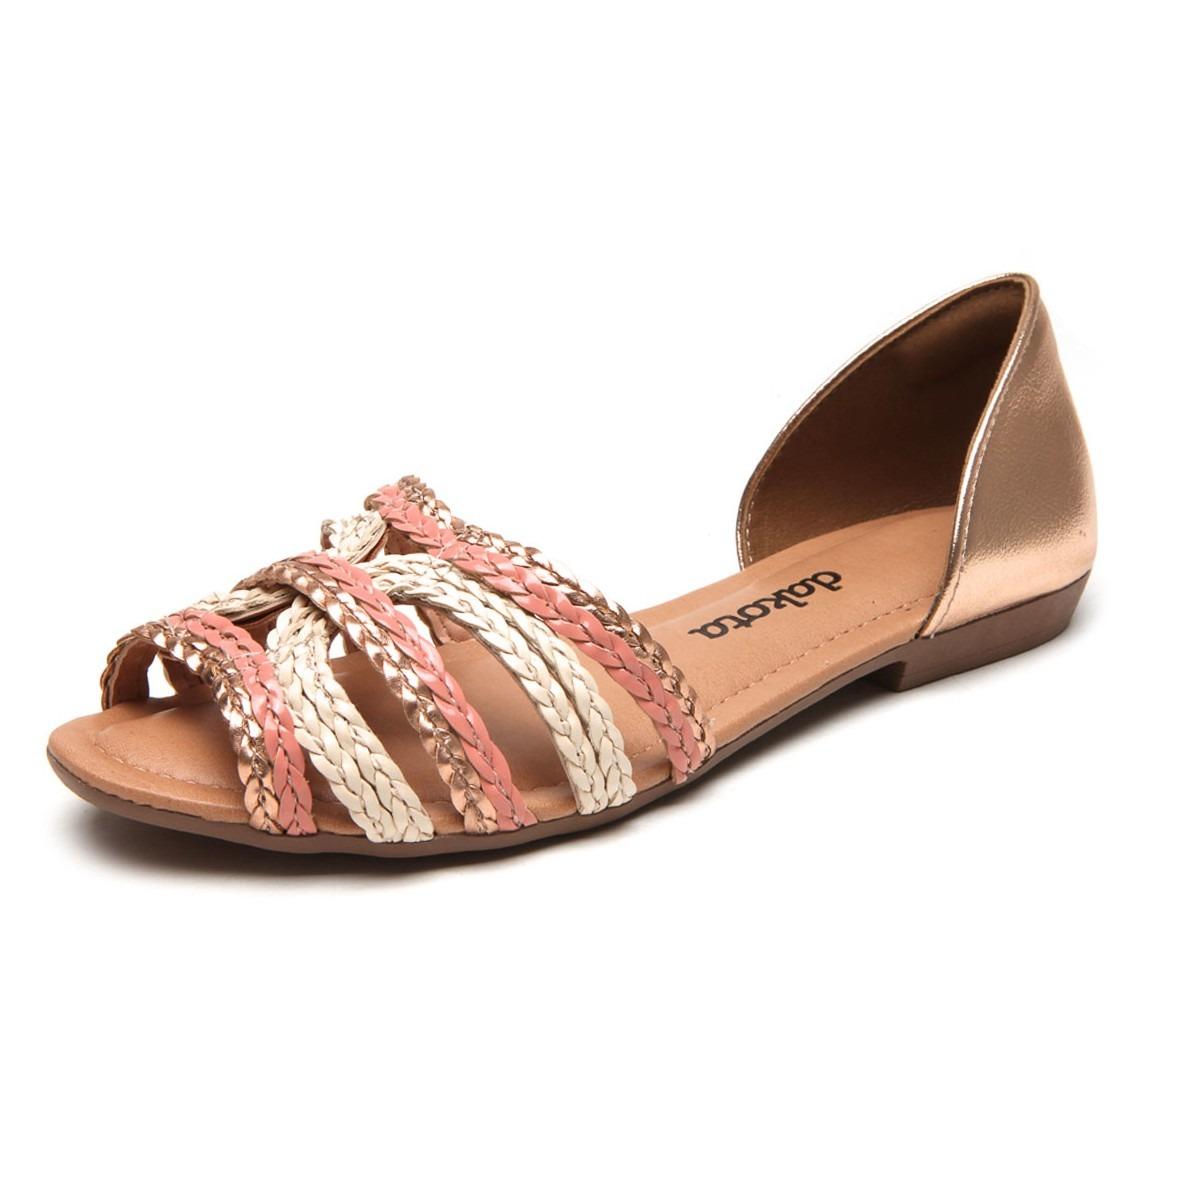 83307c203 sandália rasteira dakota tiras tressê rosê nude z1911. Carregando zoom.